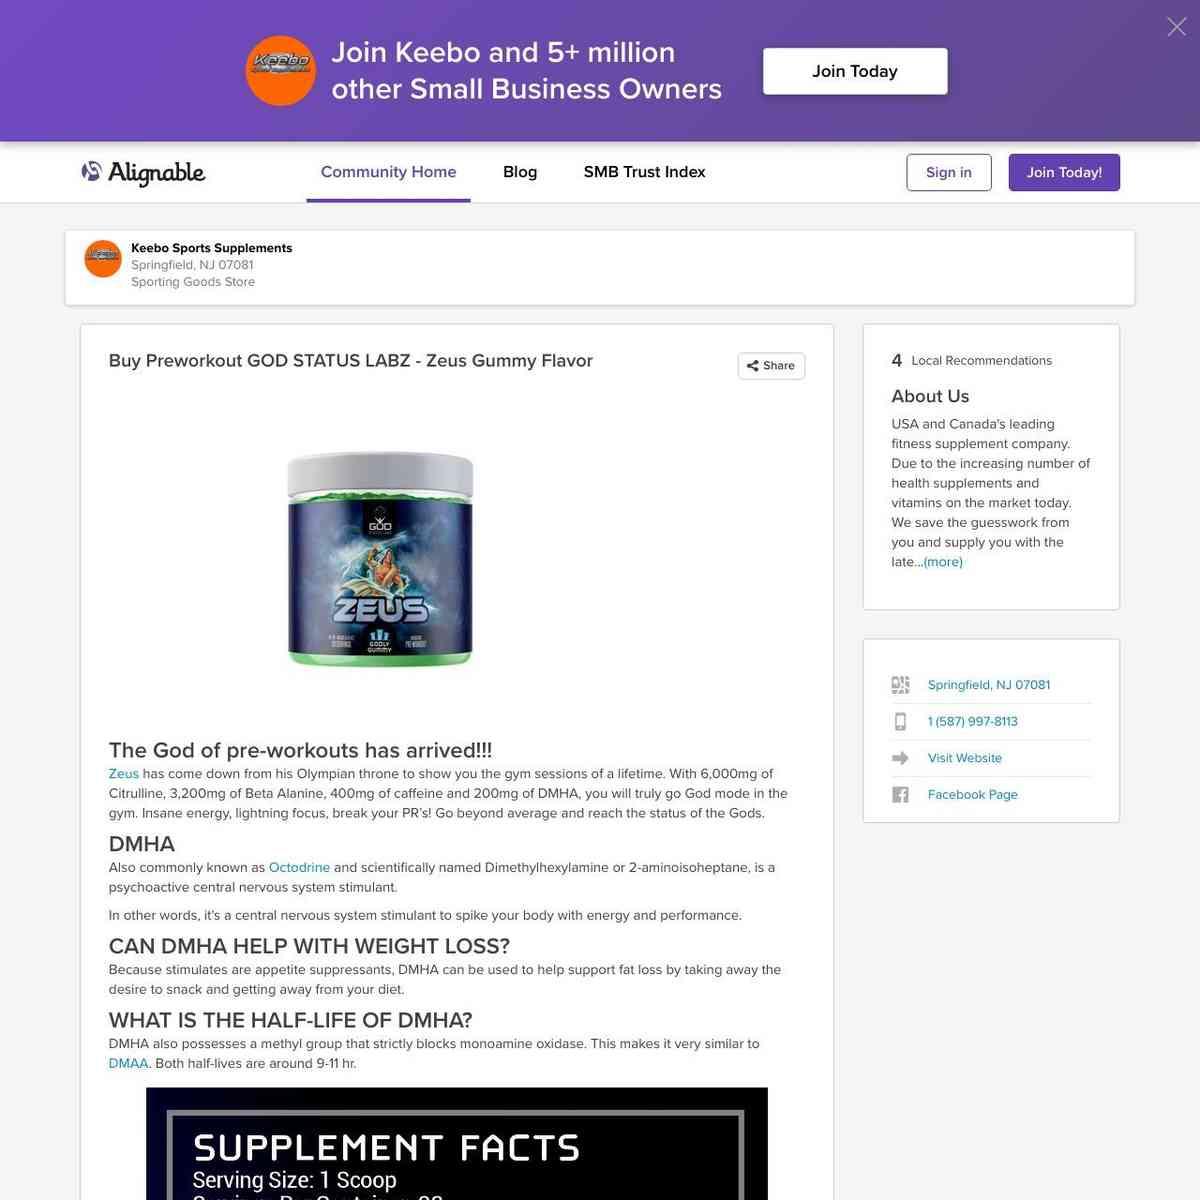 Buy Preworkout GOD STATUS LABZ - Zeus Gummy Flavor